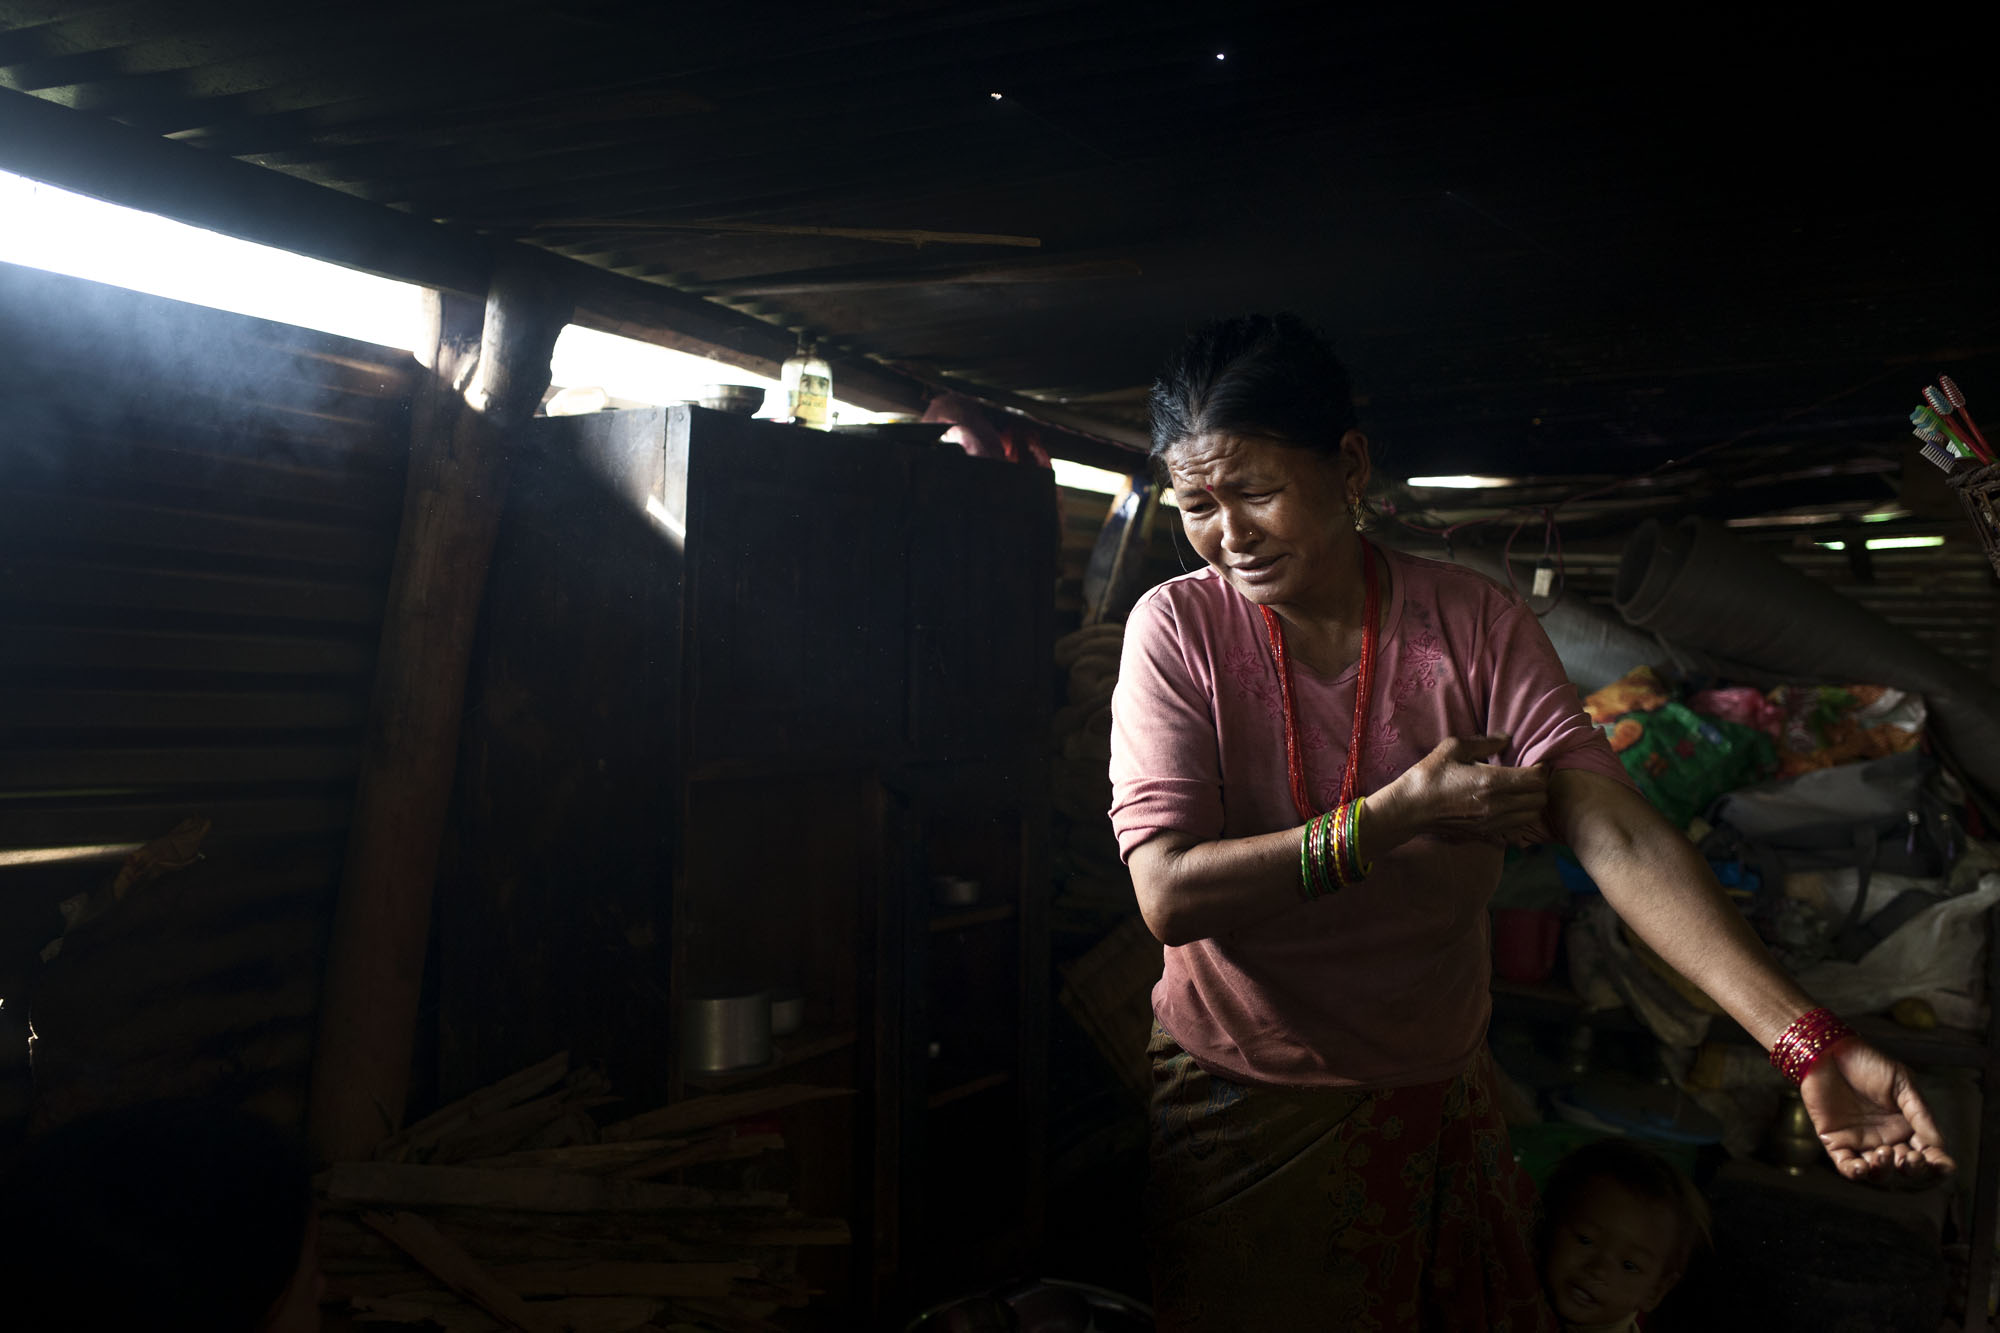 Hima Devp Magar age 46 prepares to make breakfast in her temporary shelter. Kandambas Village Ward No. 5 Sindupalcowk District, Nepal. July 30, 2015.